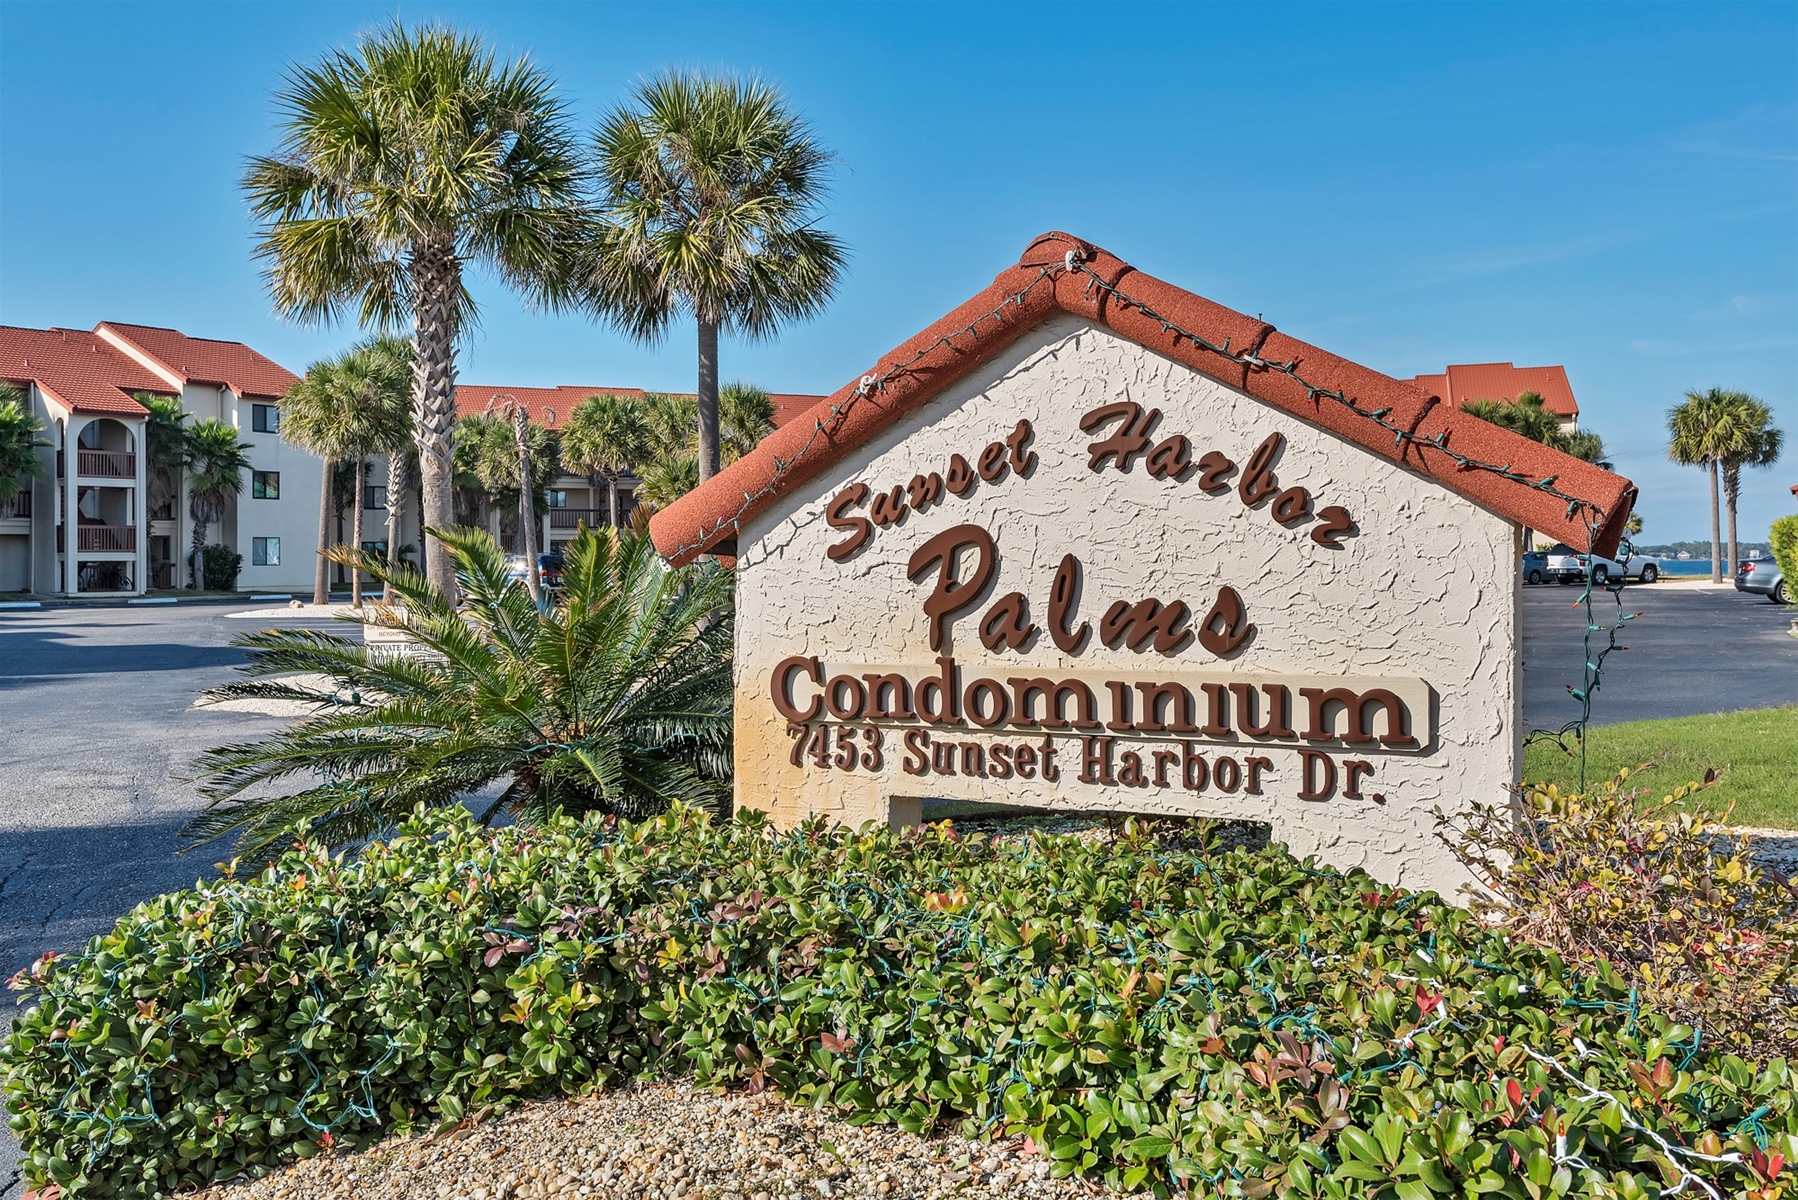 Sunset Harbor Palms Condominiums Navarre Beach FL